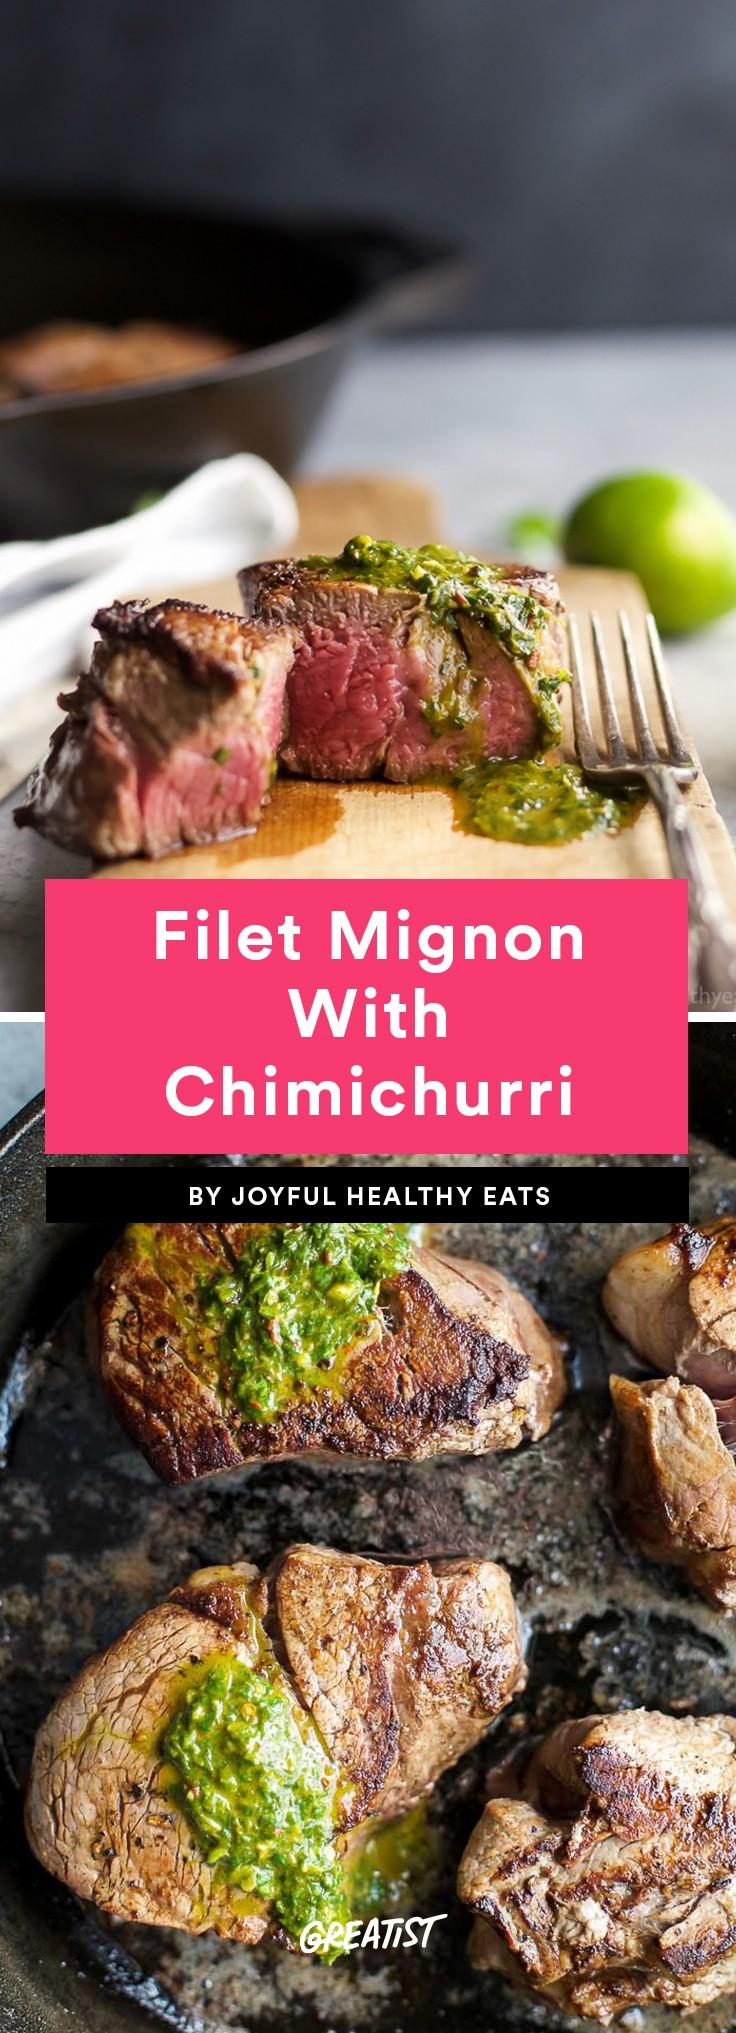 Filet Mignon With Chimichurri